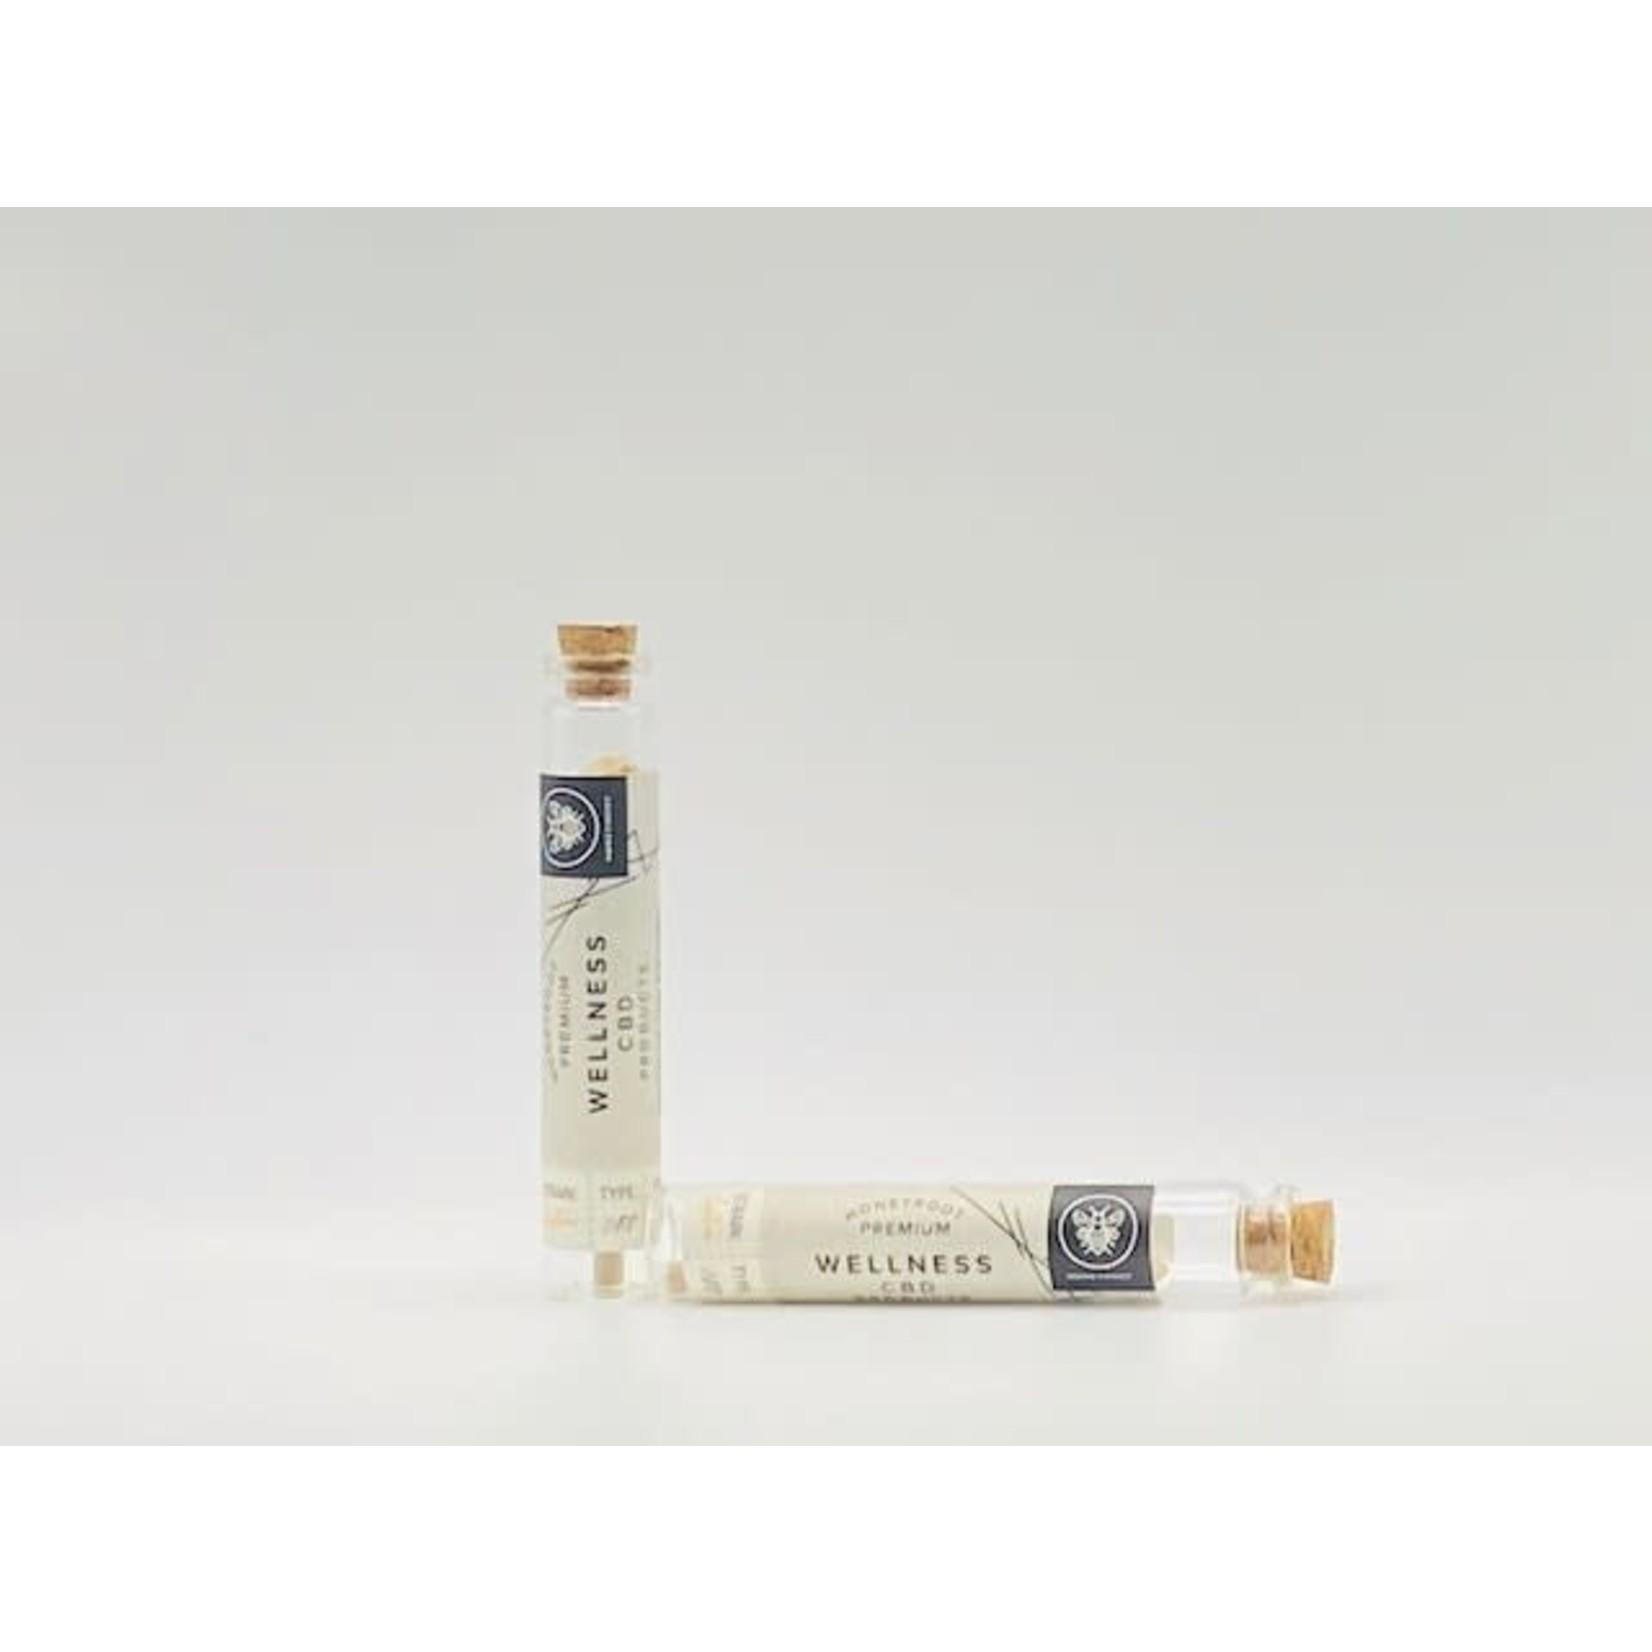 Honey Root HR CBD Flower Special Sauce 1gram Preroll